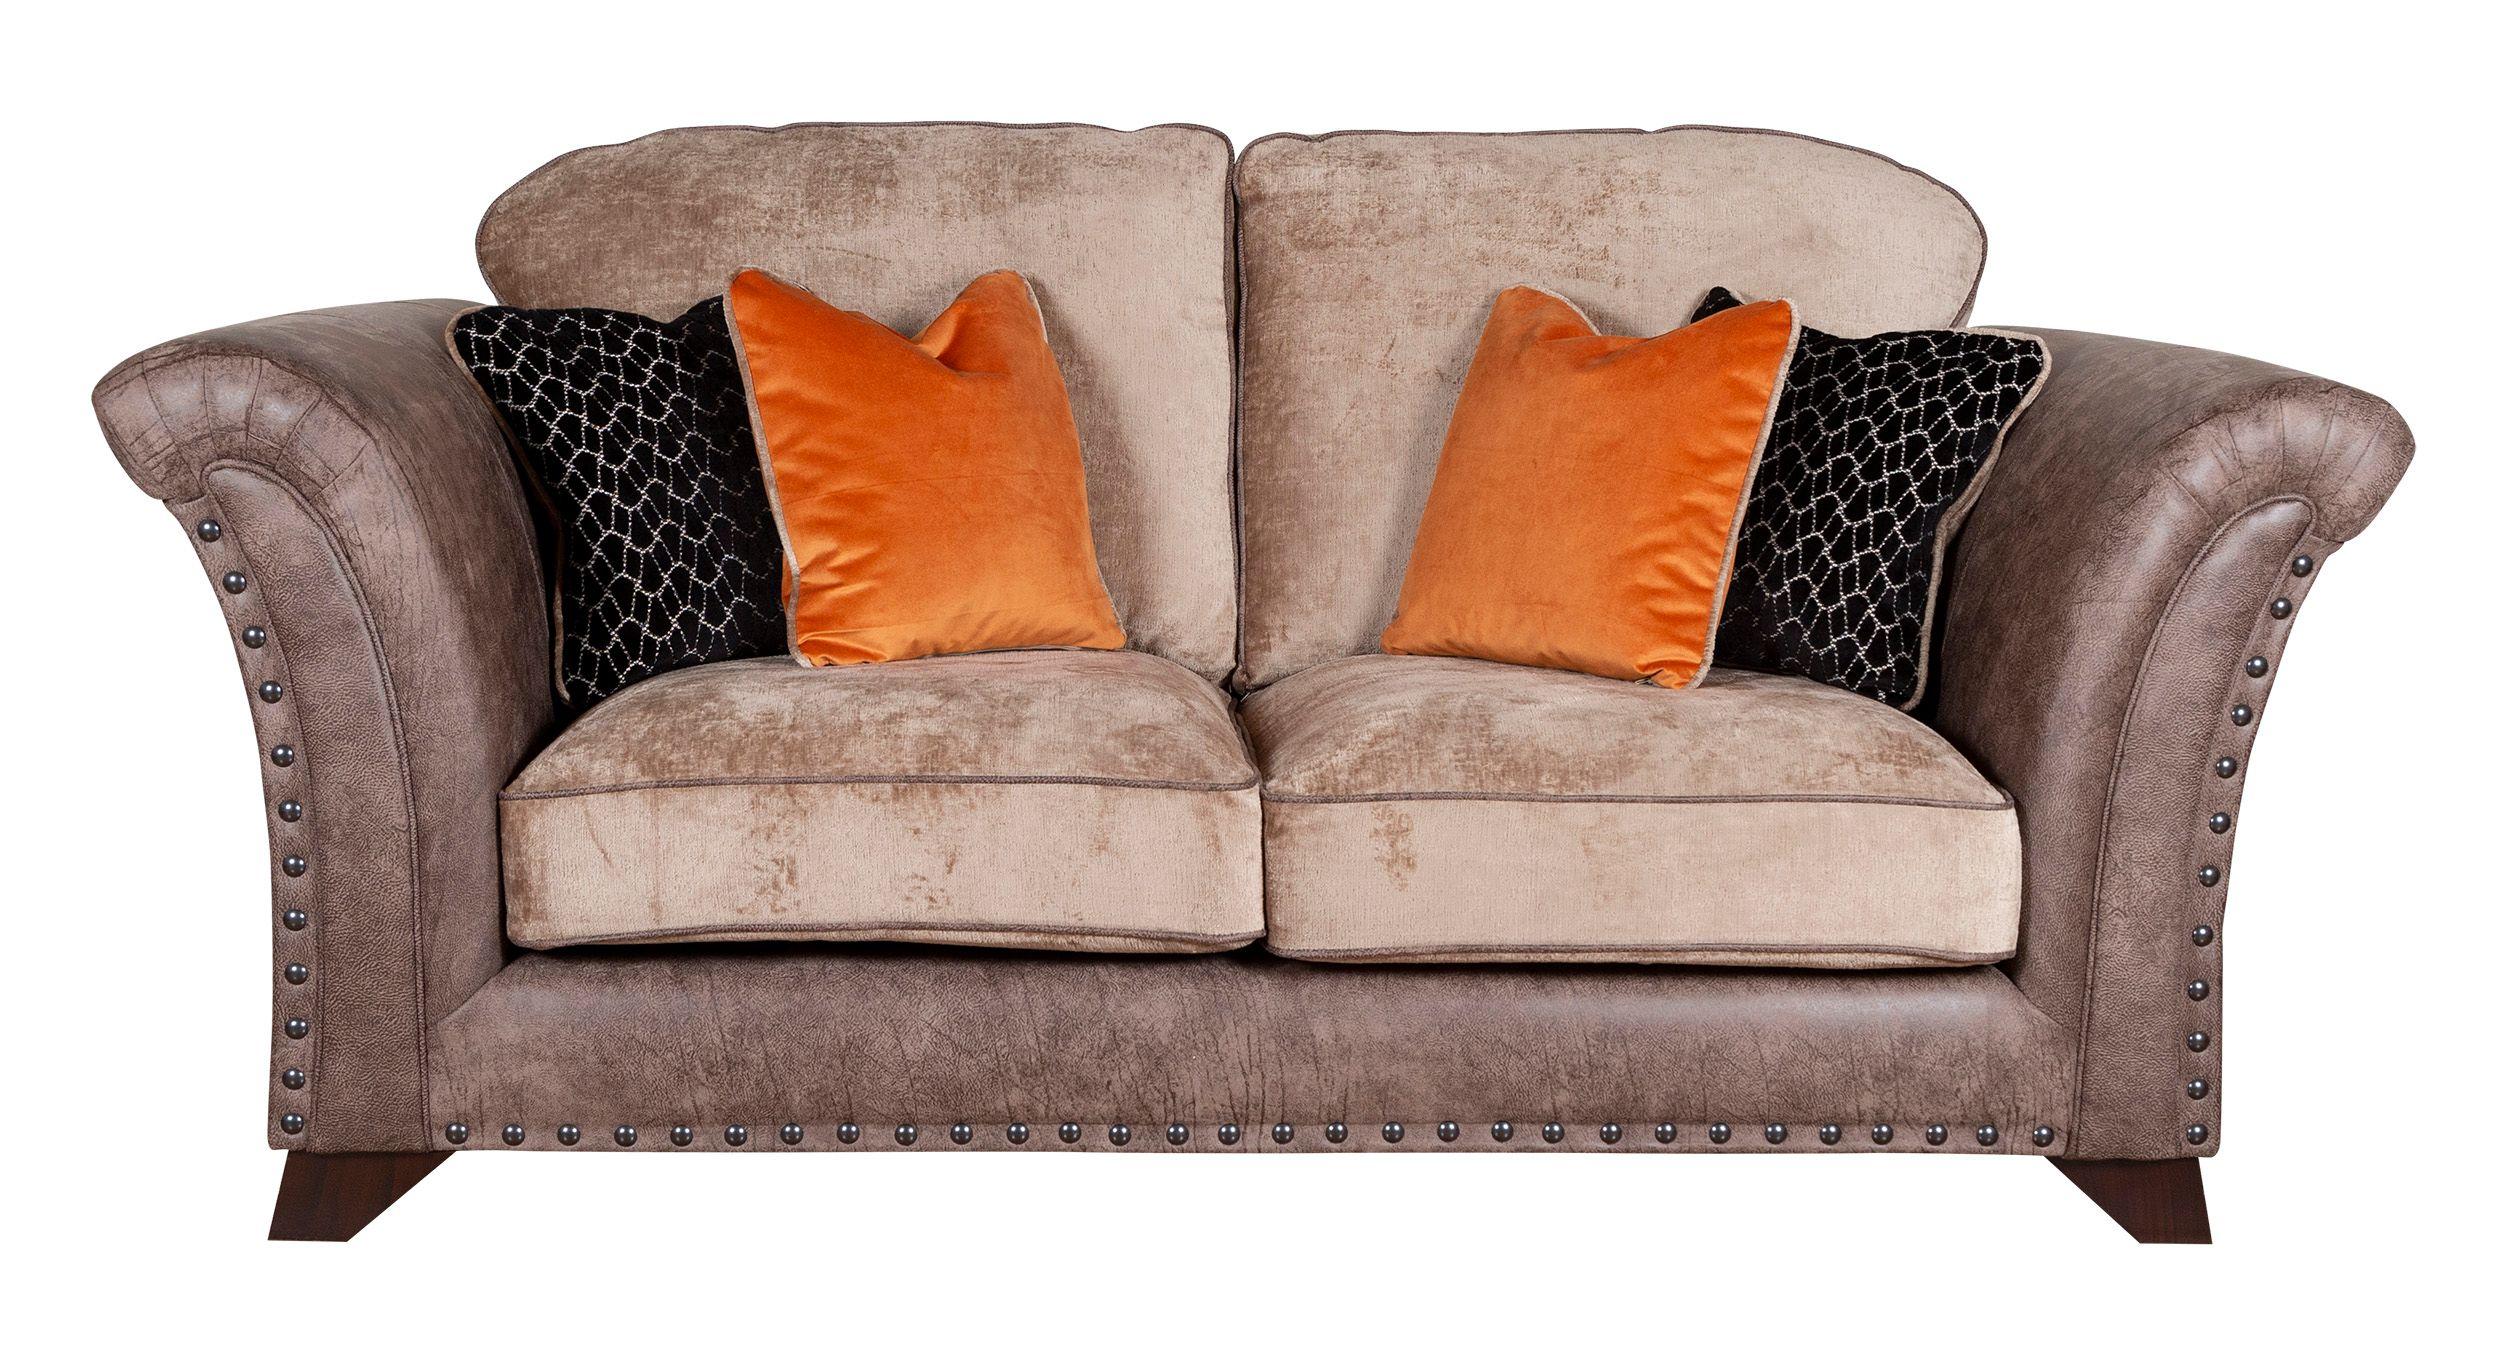 WESTMINSTER Standard Back 2 Seater Modular Sofa